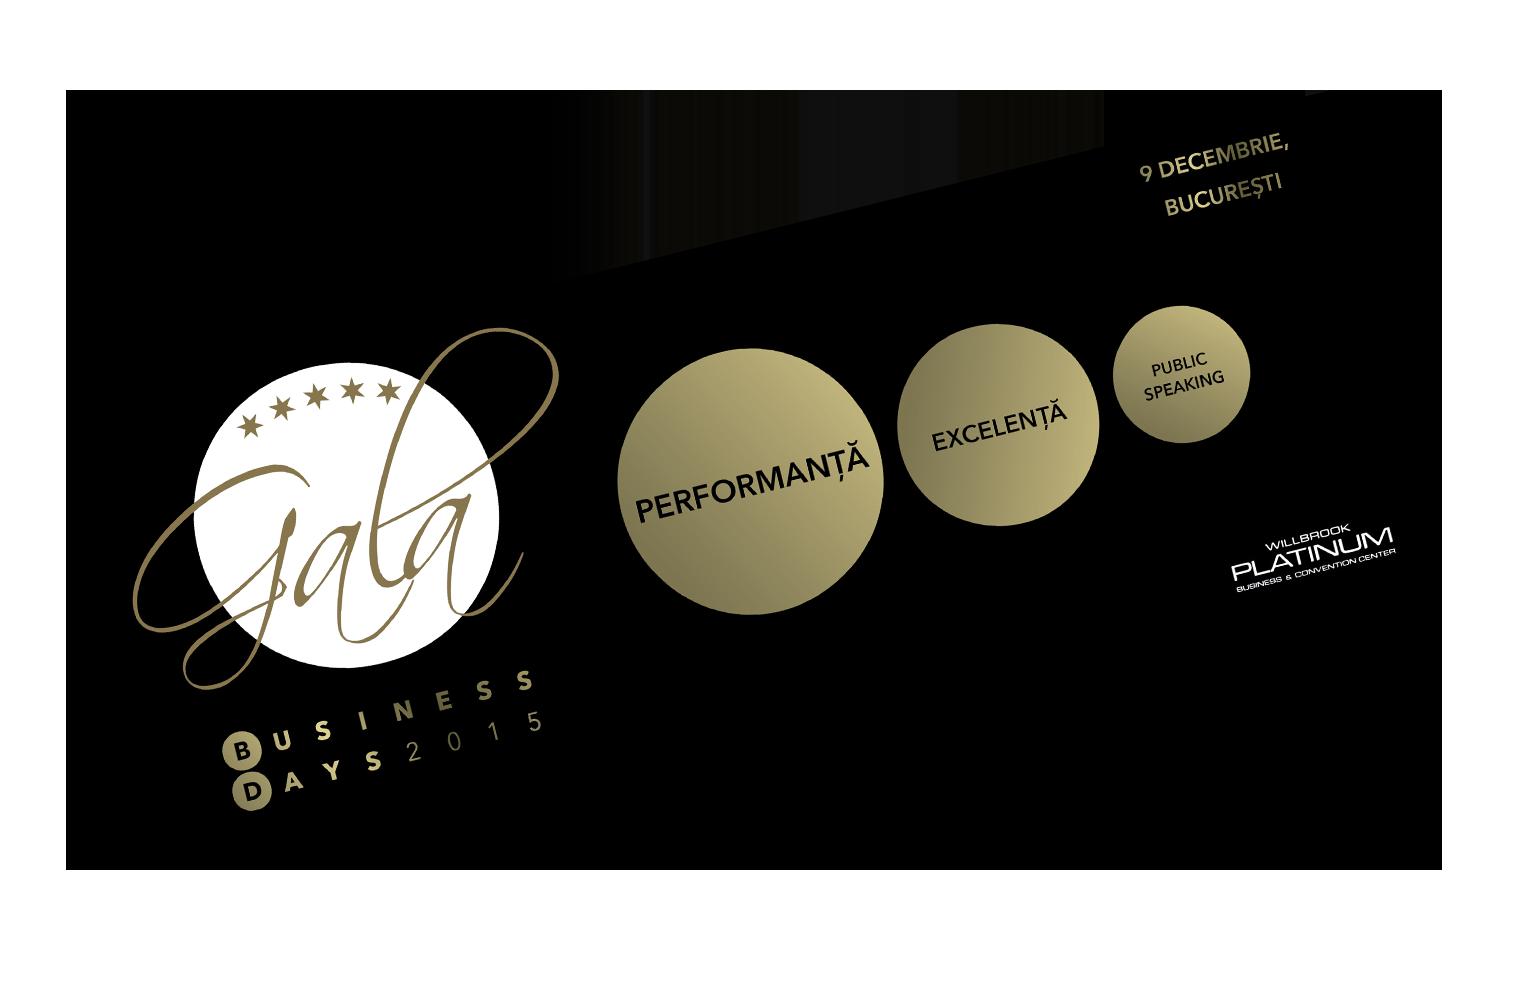 gala-bd_flyer-3